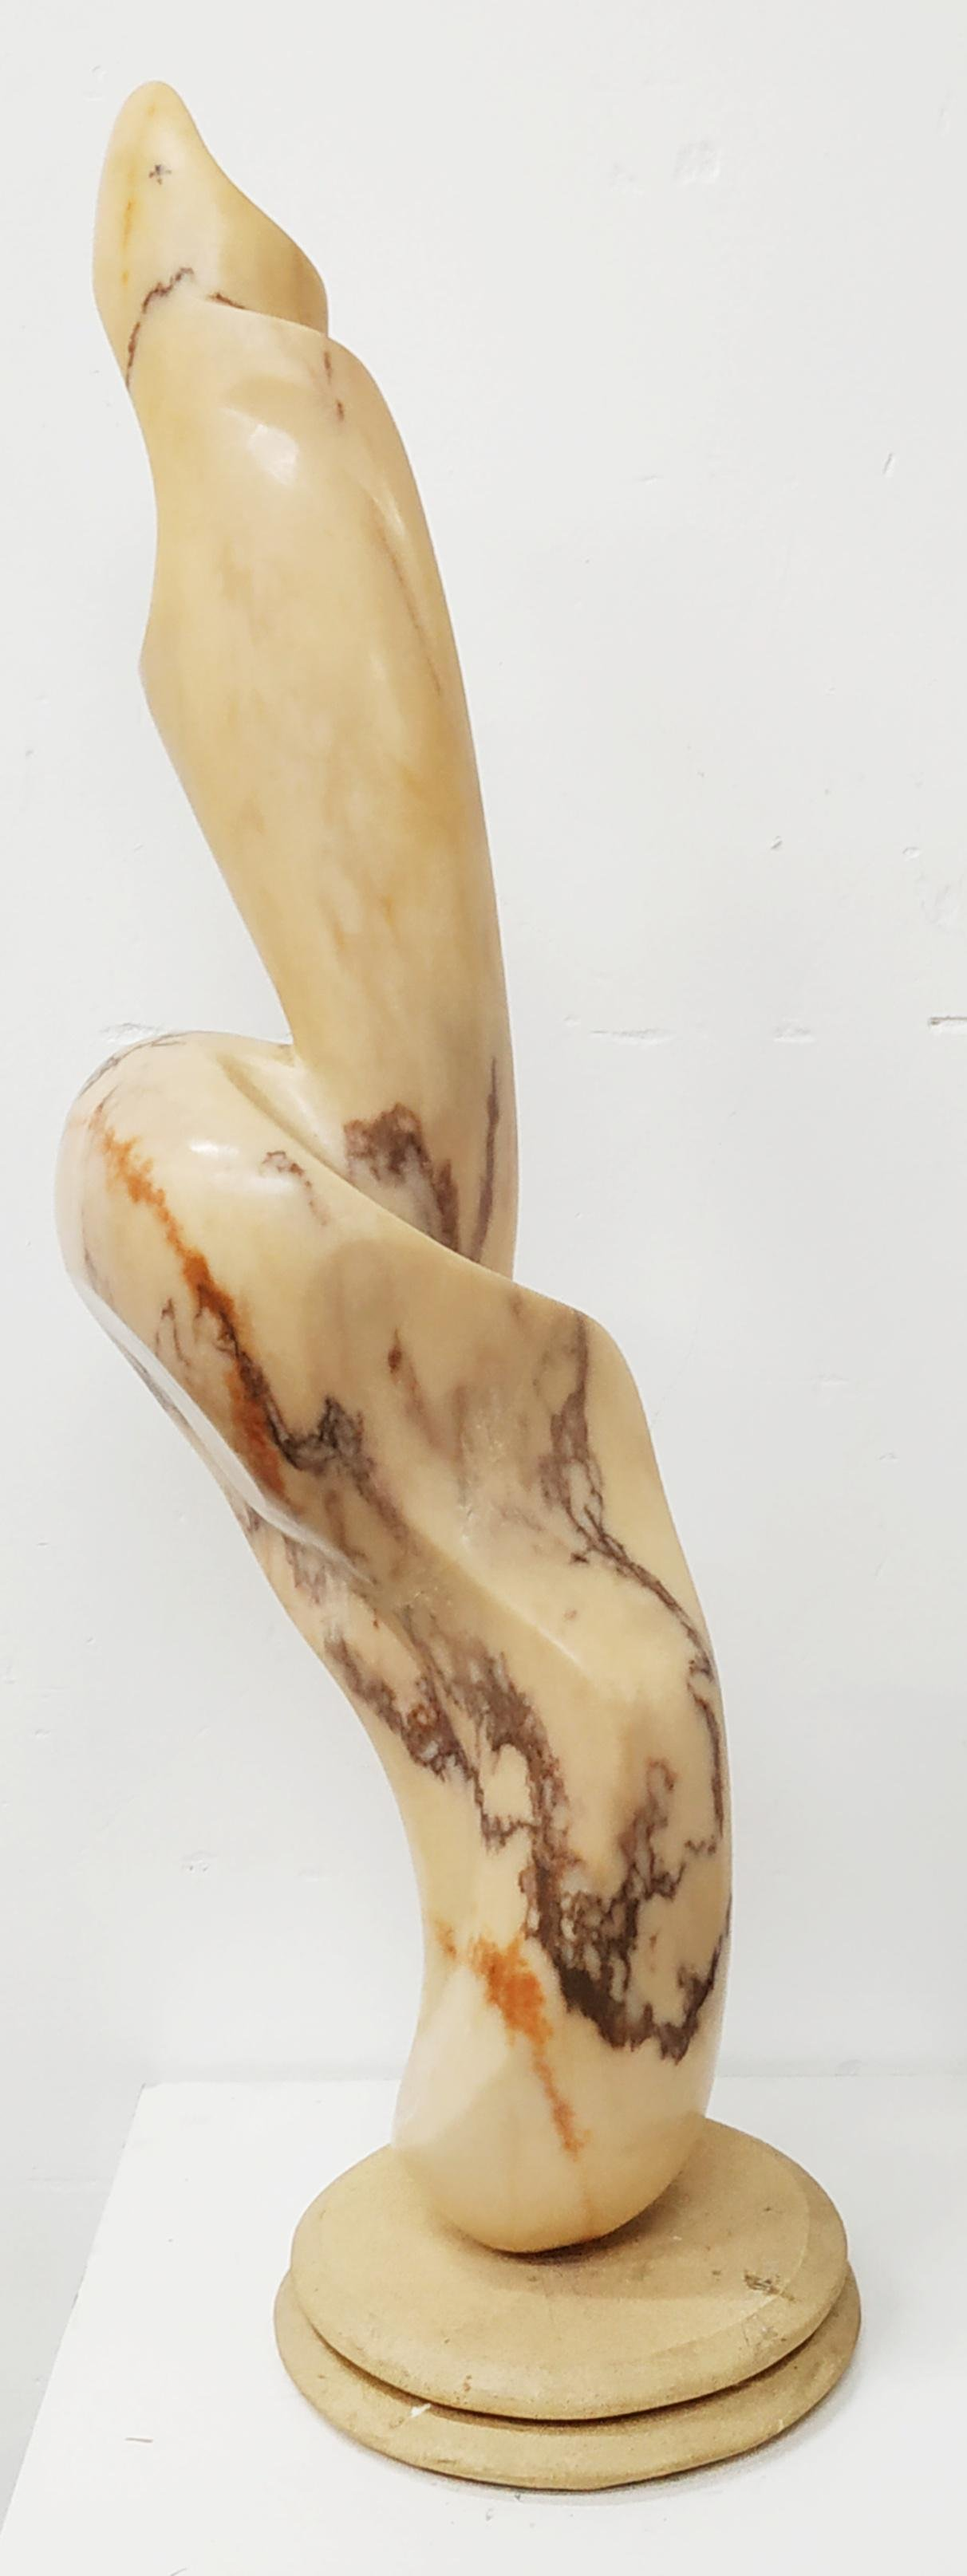 Gadi Fraiman- large stone figure